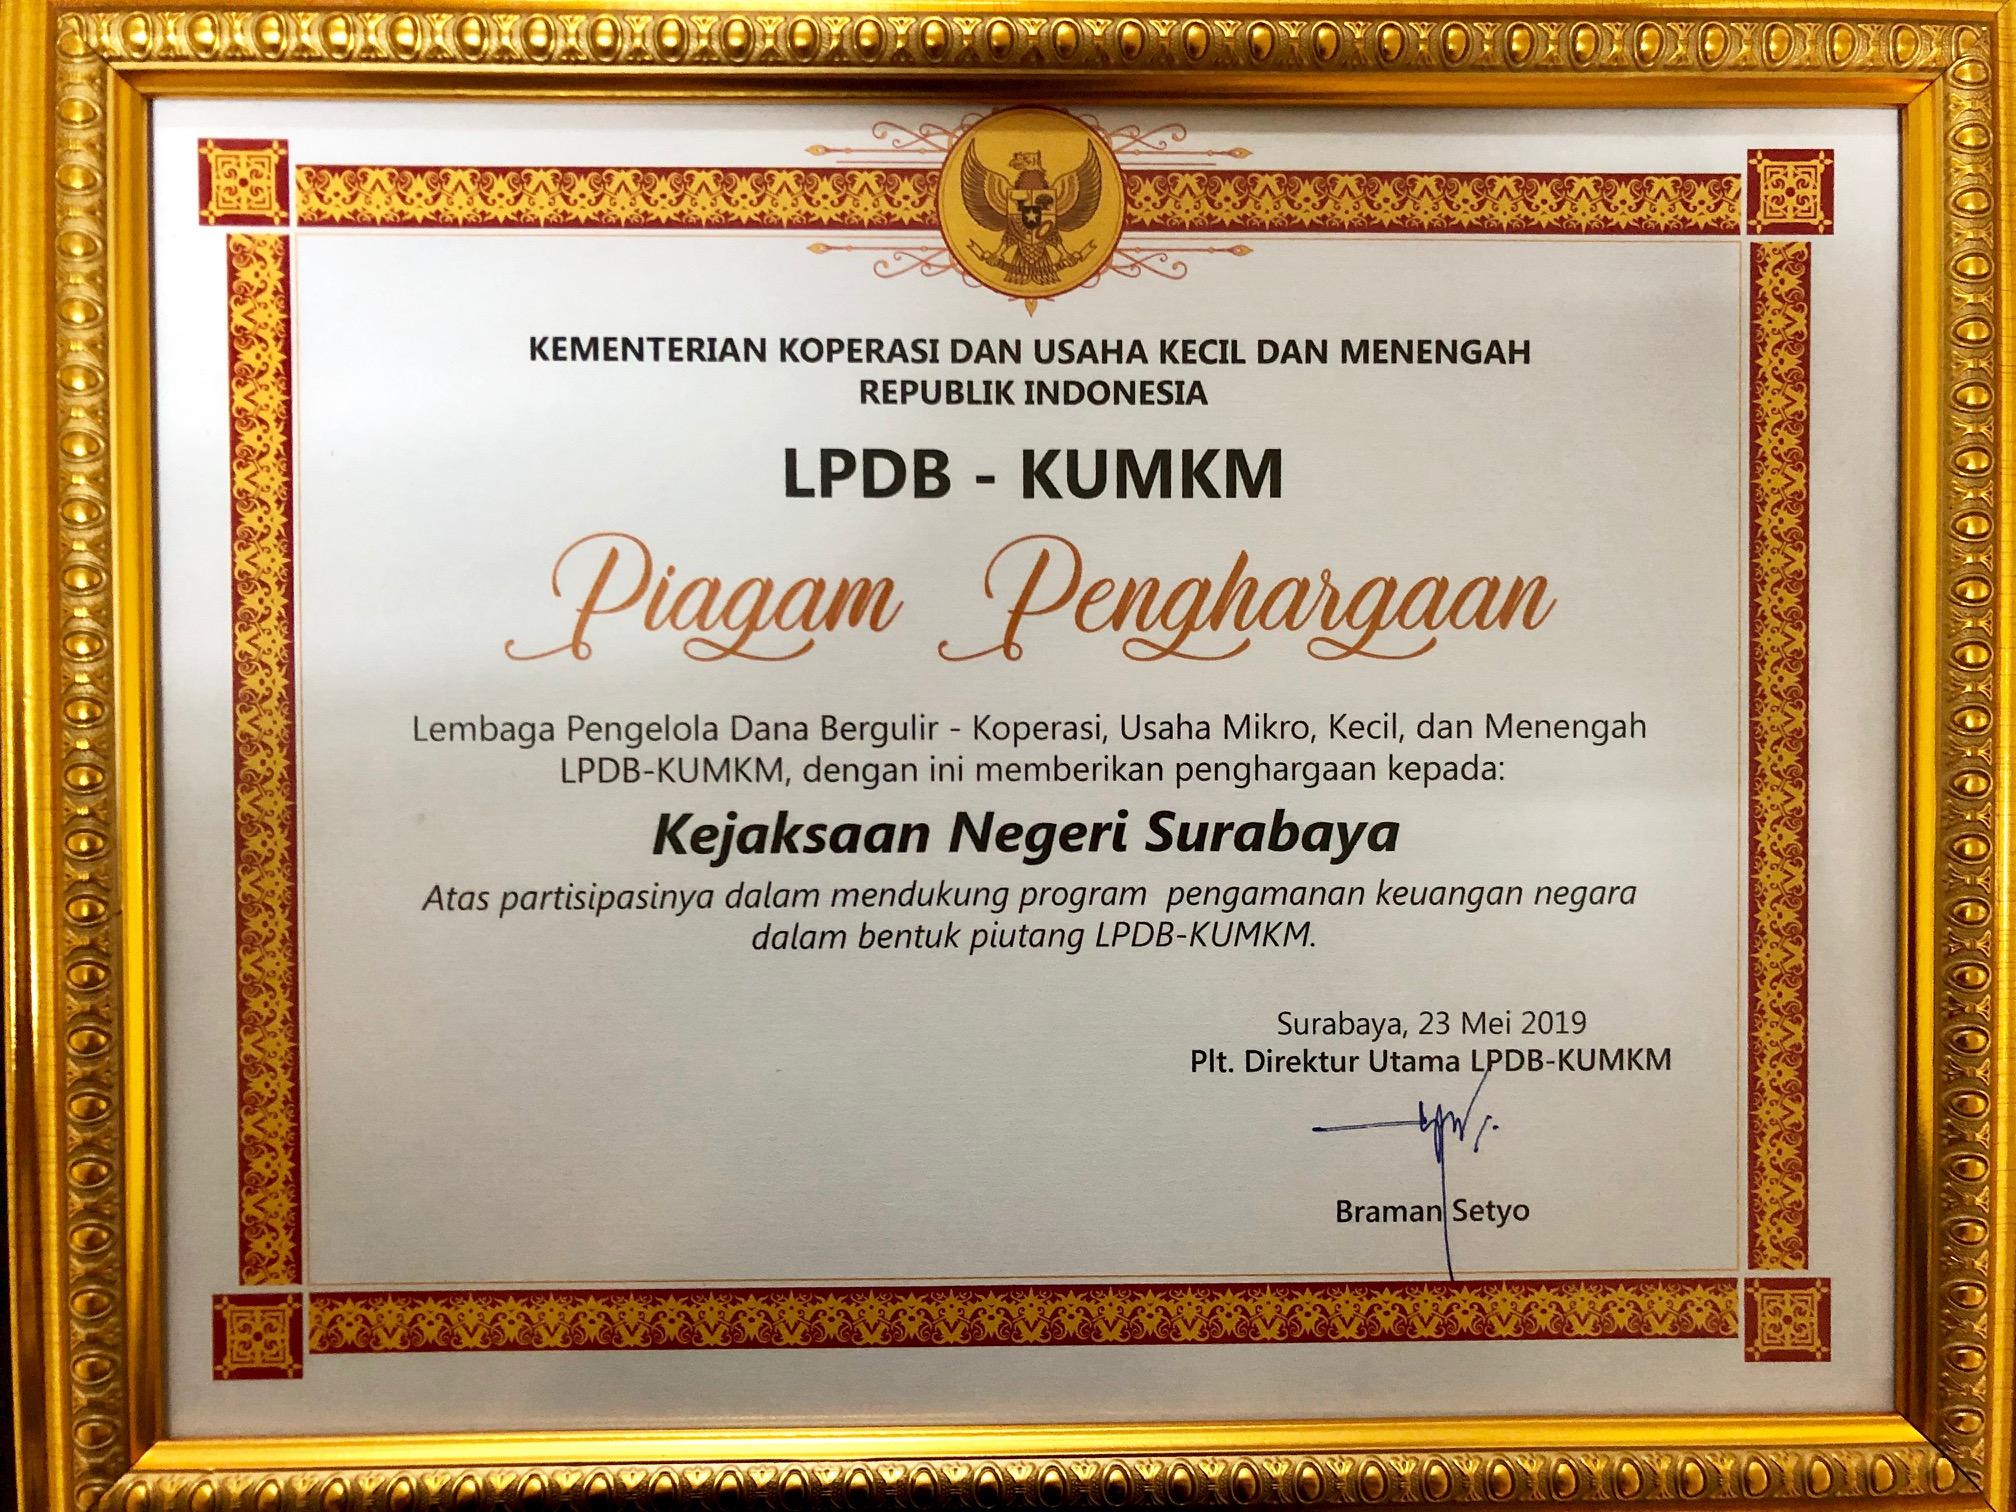 Kajari Surabaya Menerima Penghargaan dari LPDB KUMKM 24-05-2019